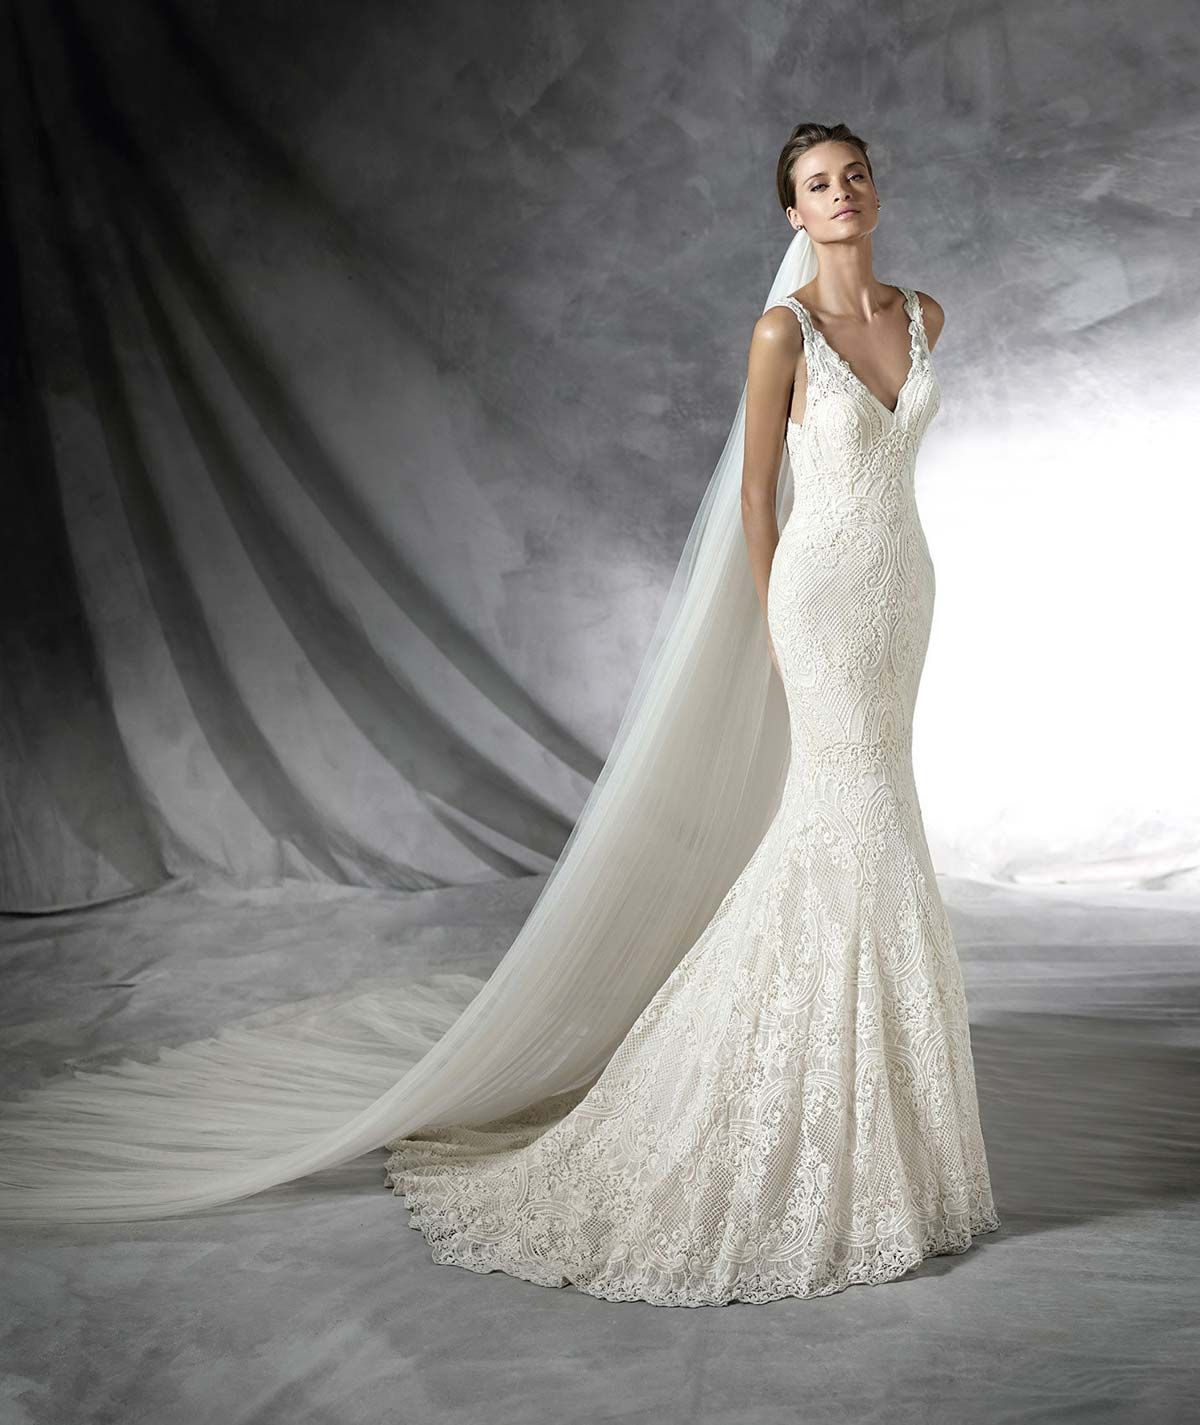 No lace wedding dress october 2018 Guipure mermaid wedding dress Vneck bodice with straps Semisheer